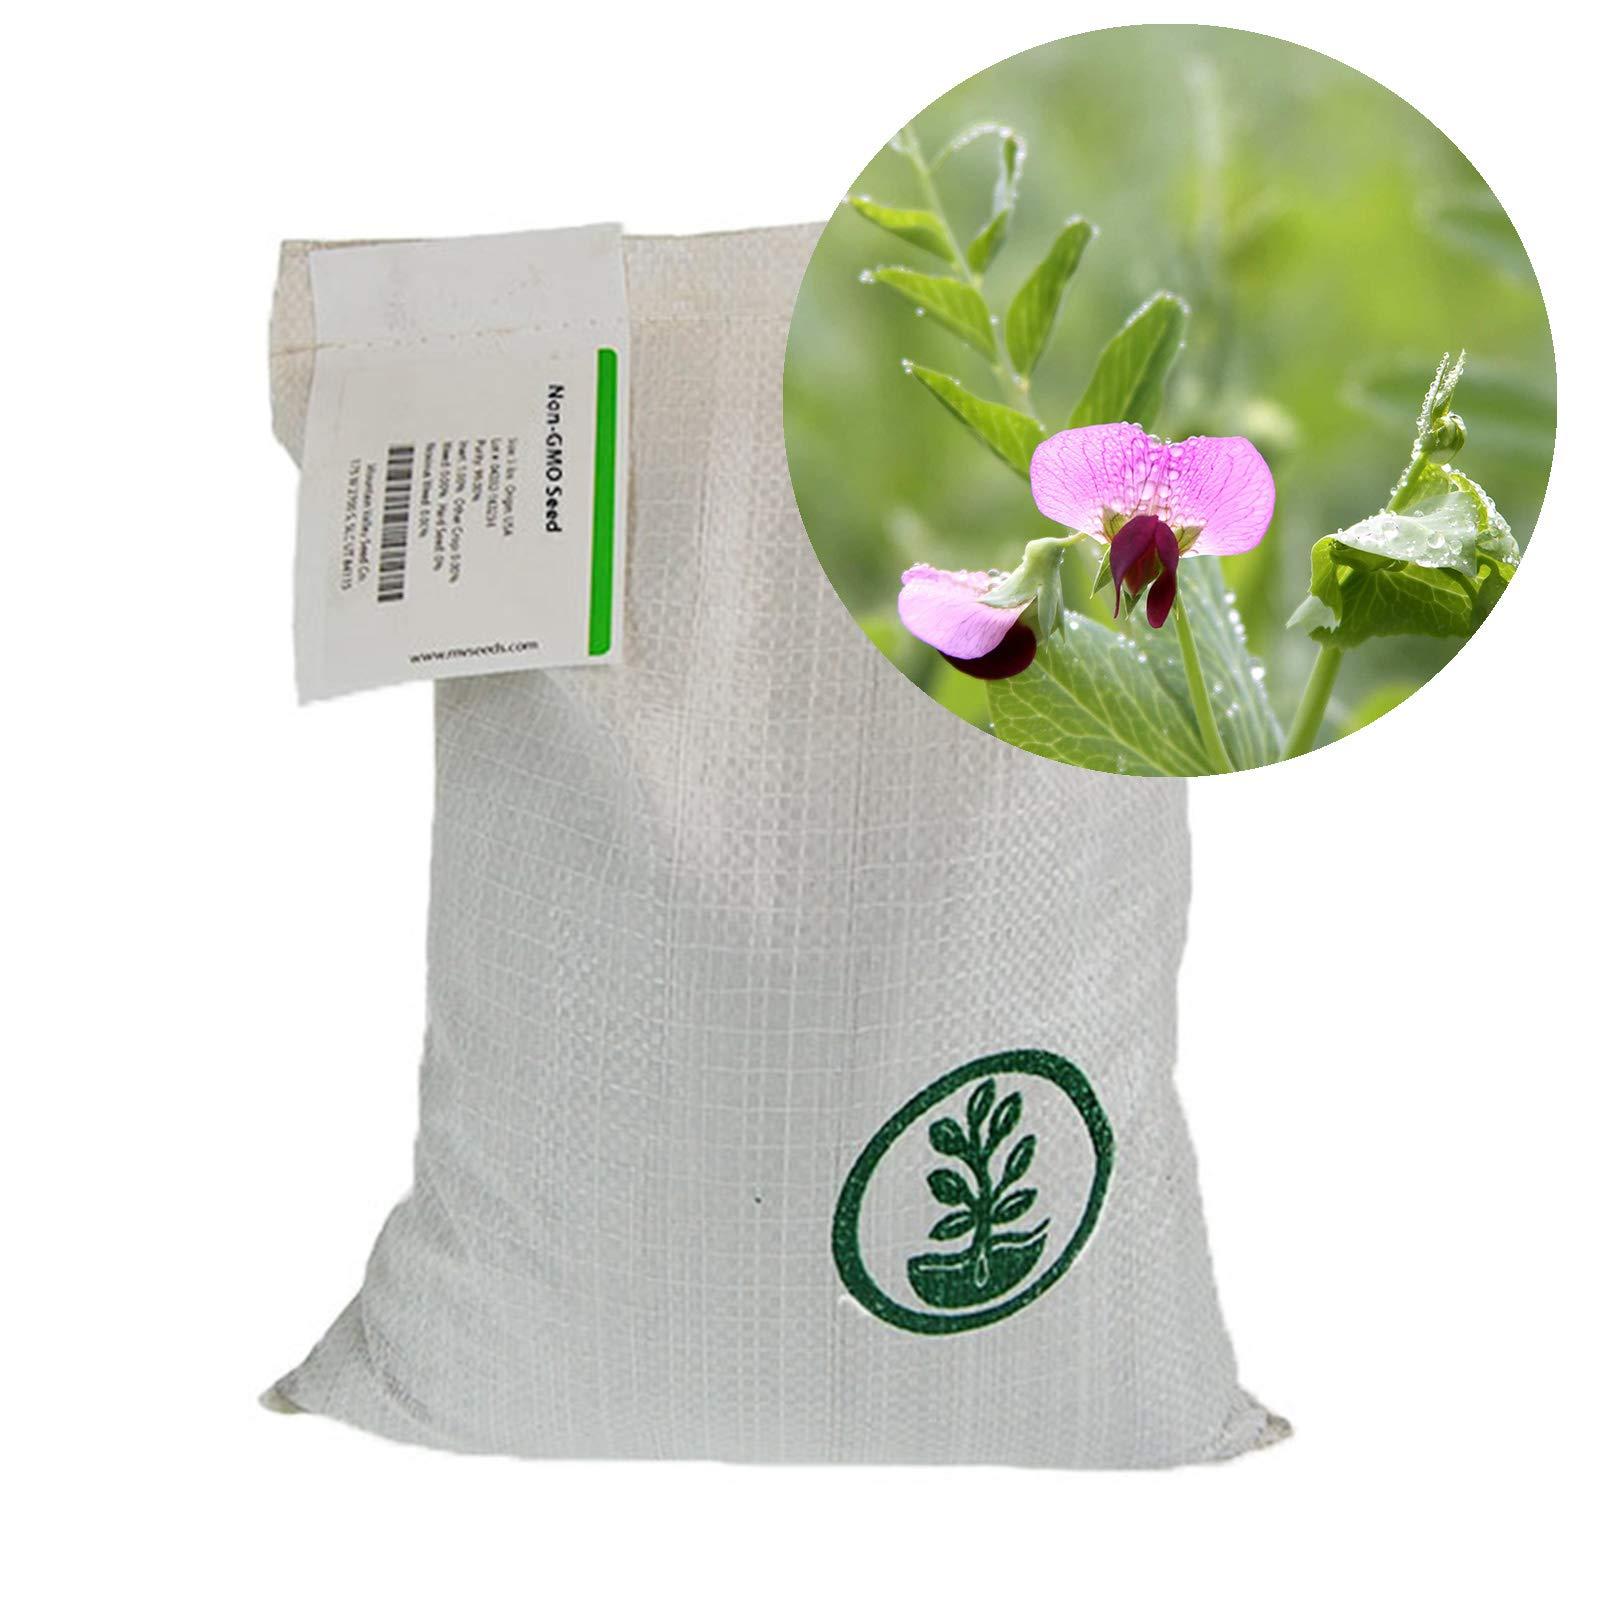 Austrian Field Pea Cover Crop Seeds - 25 Lbs - Nitrogen Fixing Viny Legume Cover Crop